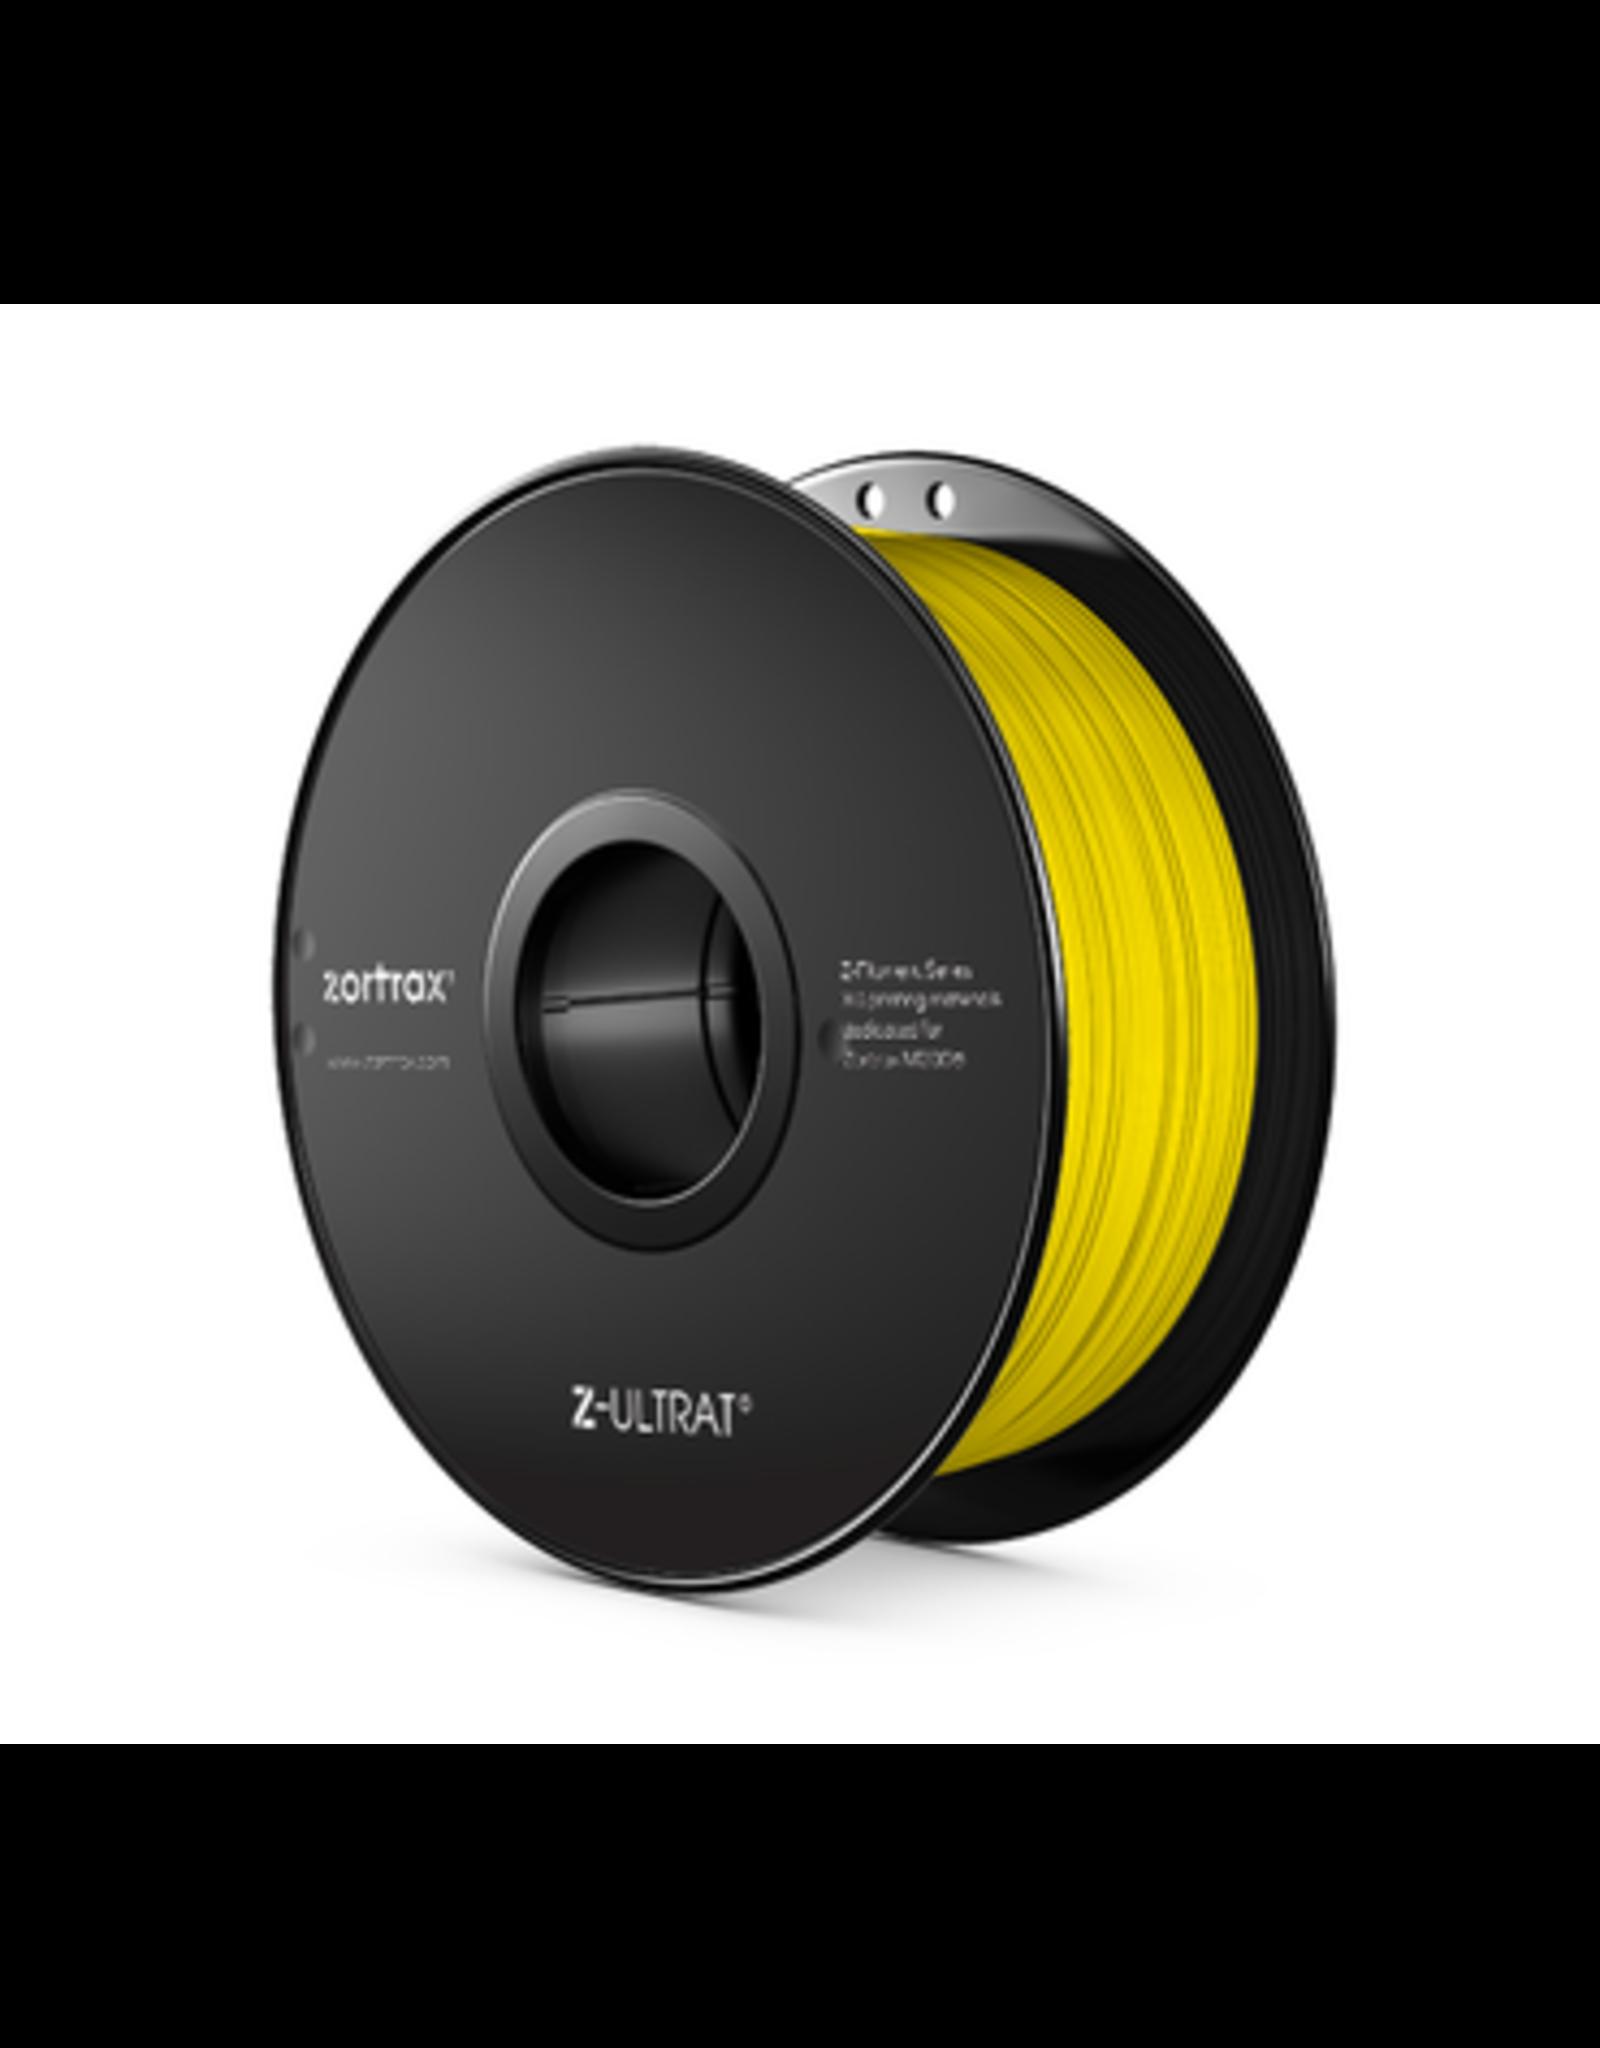 Zortrax Z-ULTRAT Filament - 1.75mm - 800g - Jaune